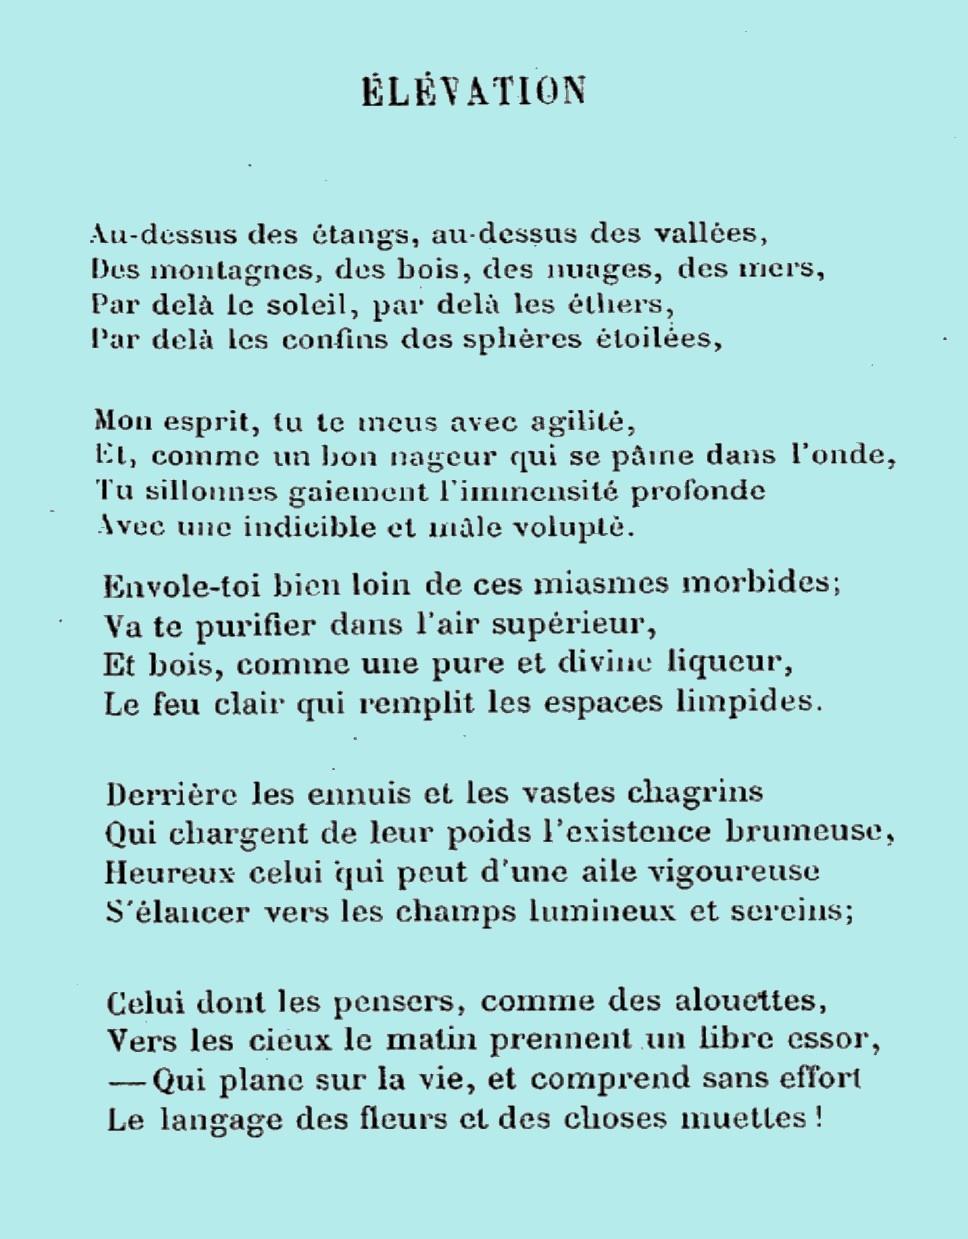 poeme fleur du mal